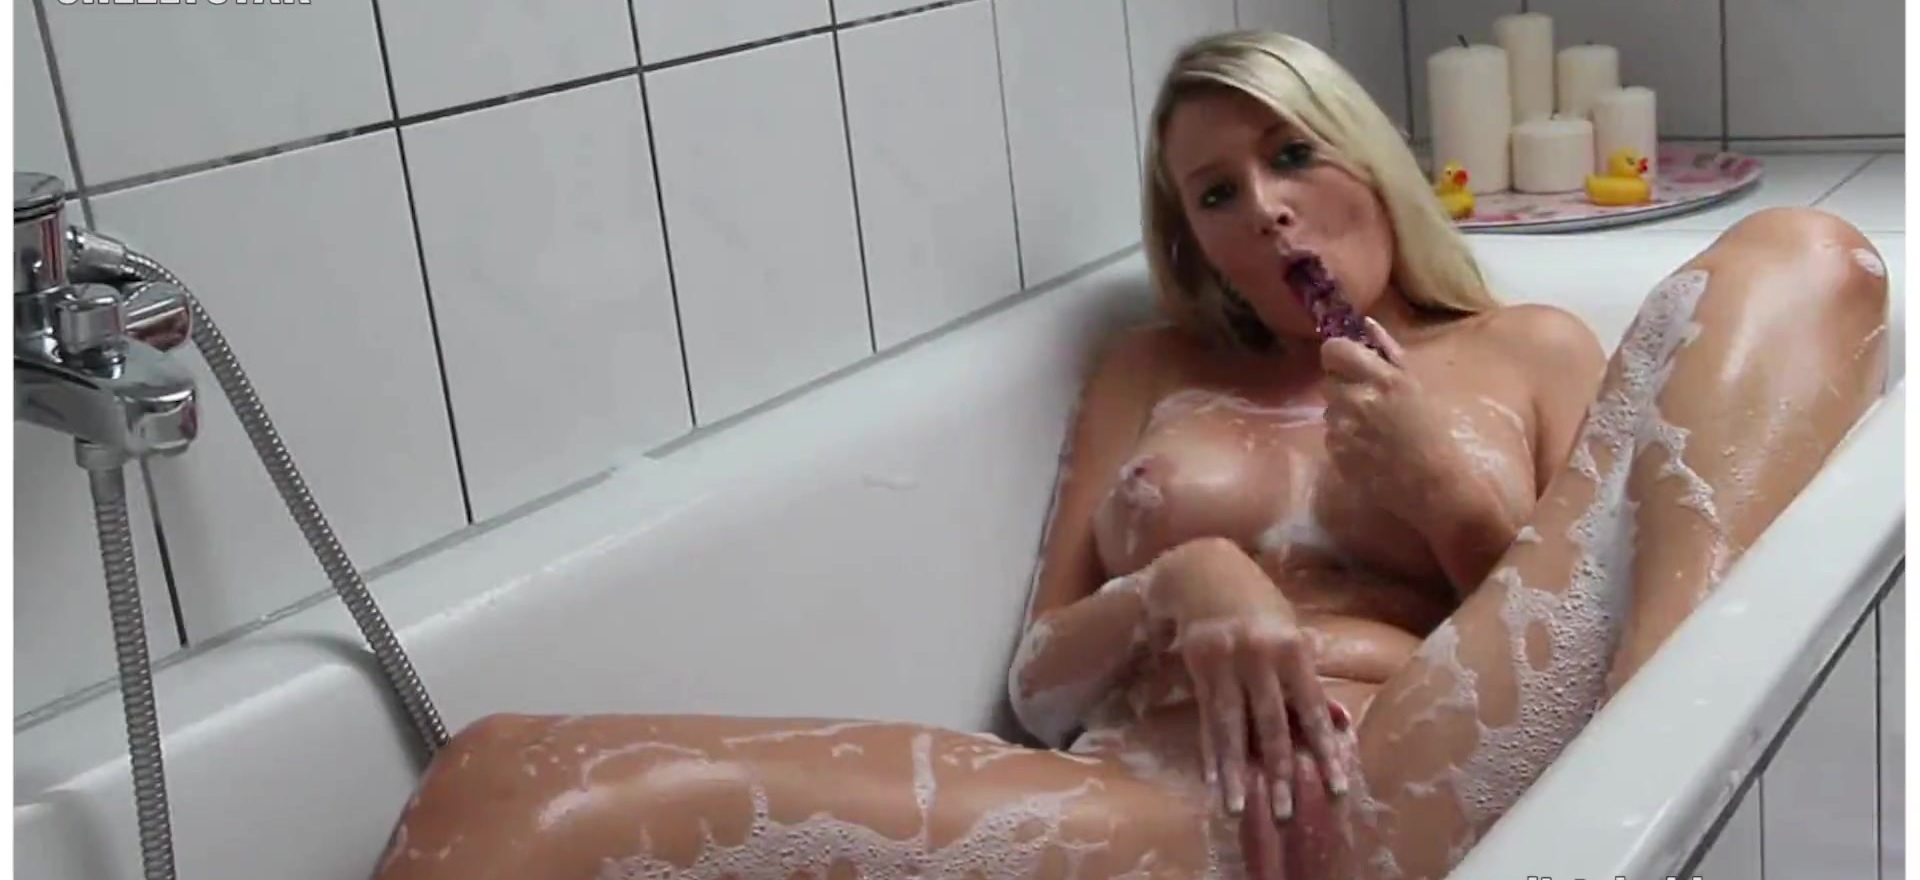 123video downloader seks video movies